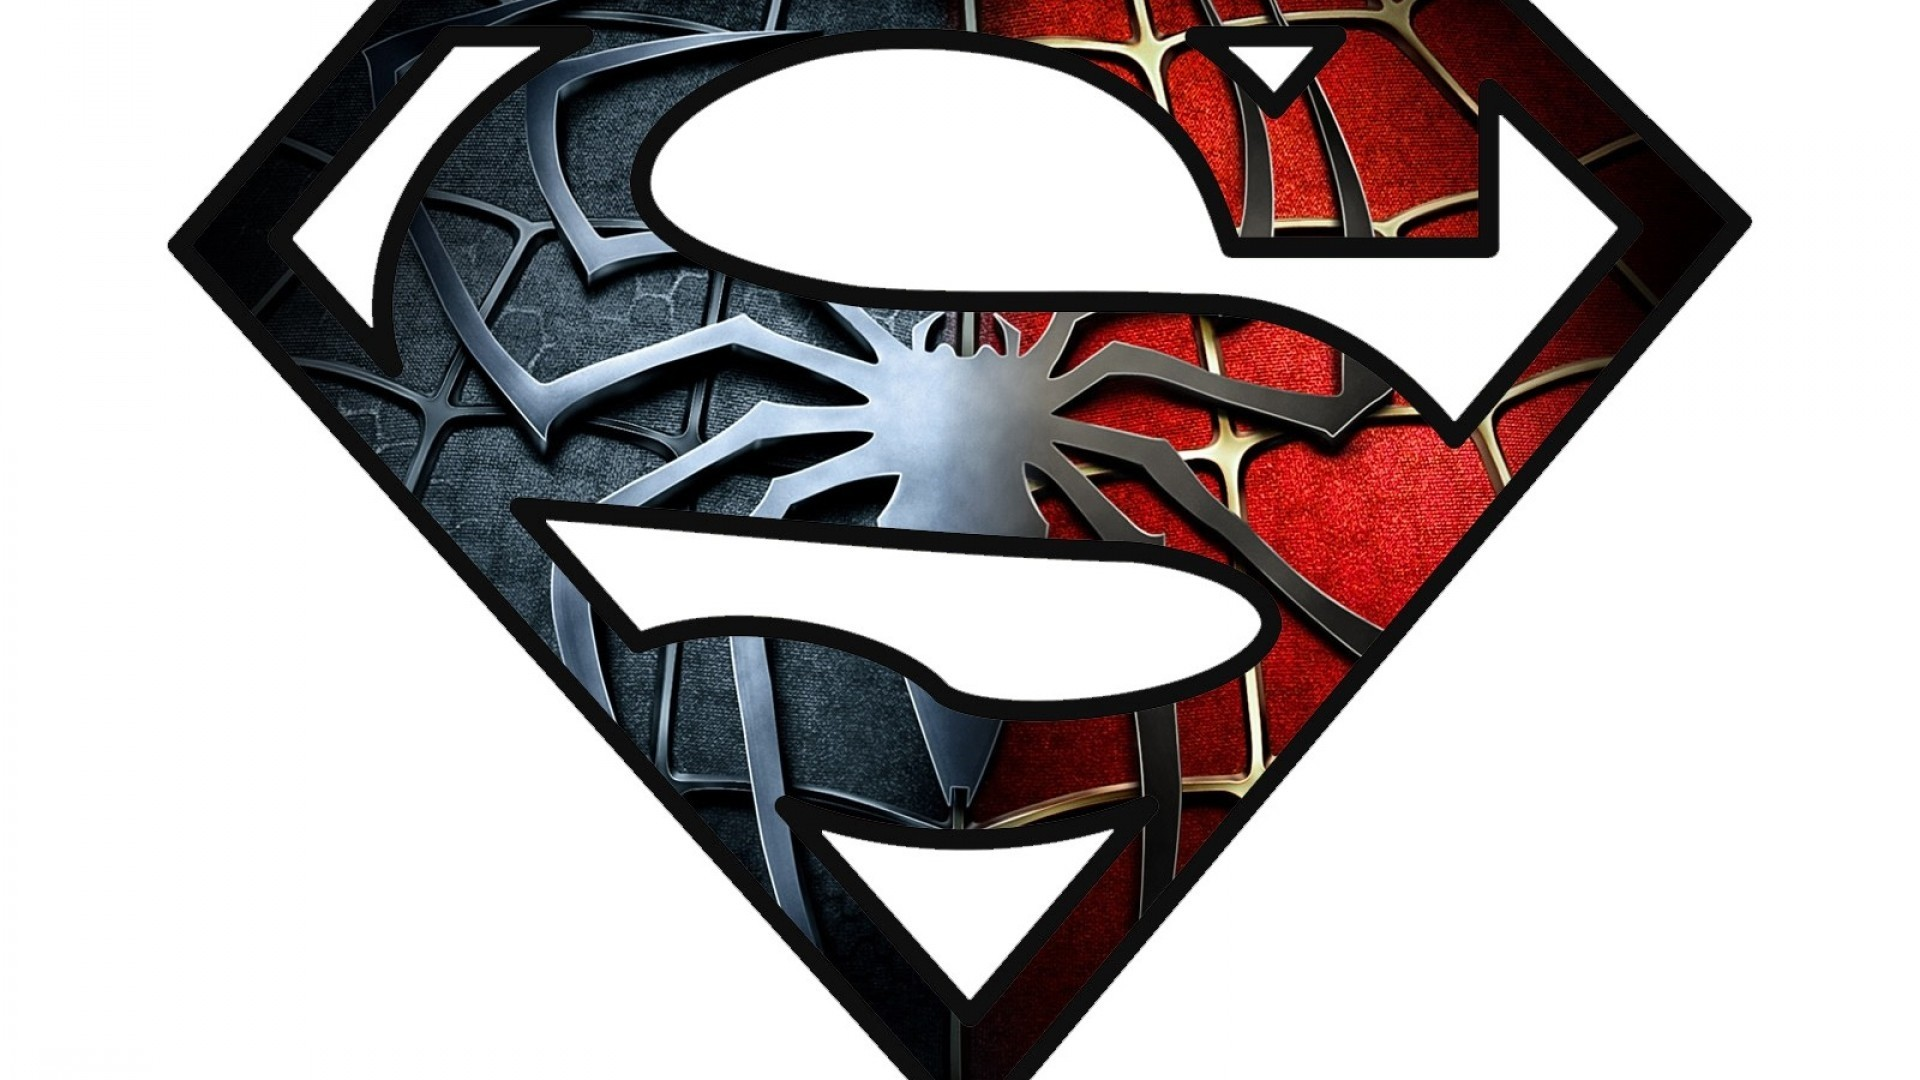 superman logo wallpaper 2018 (56+ images)